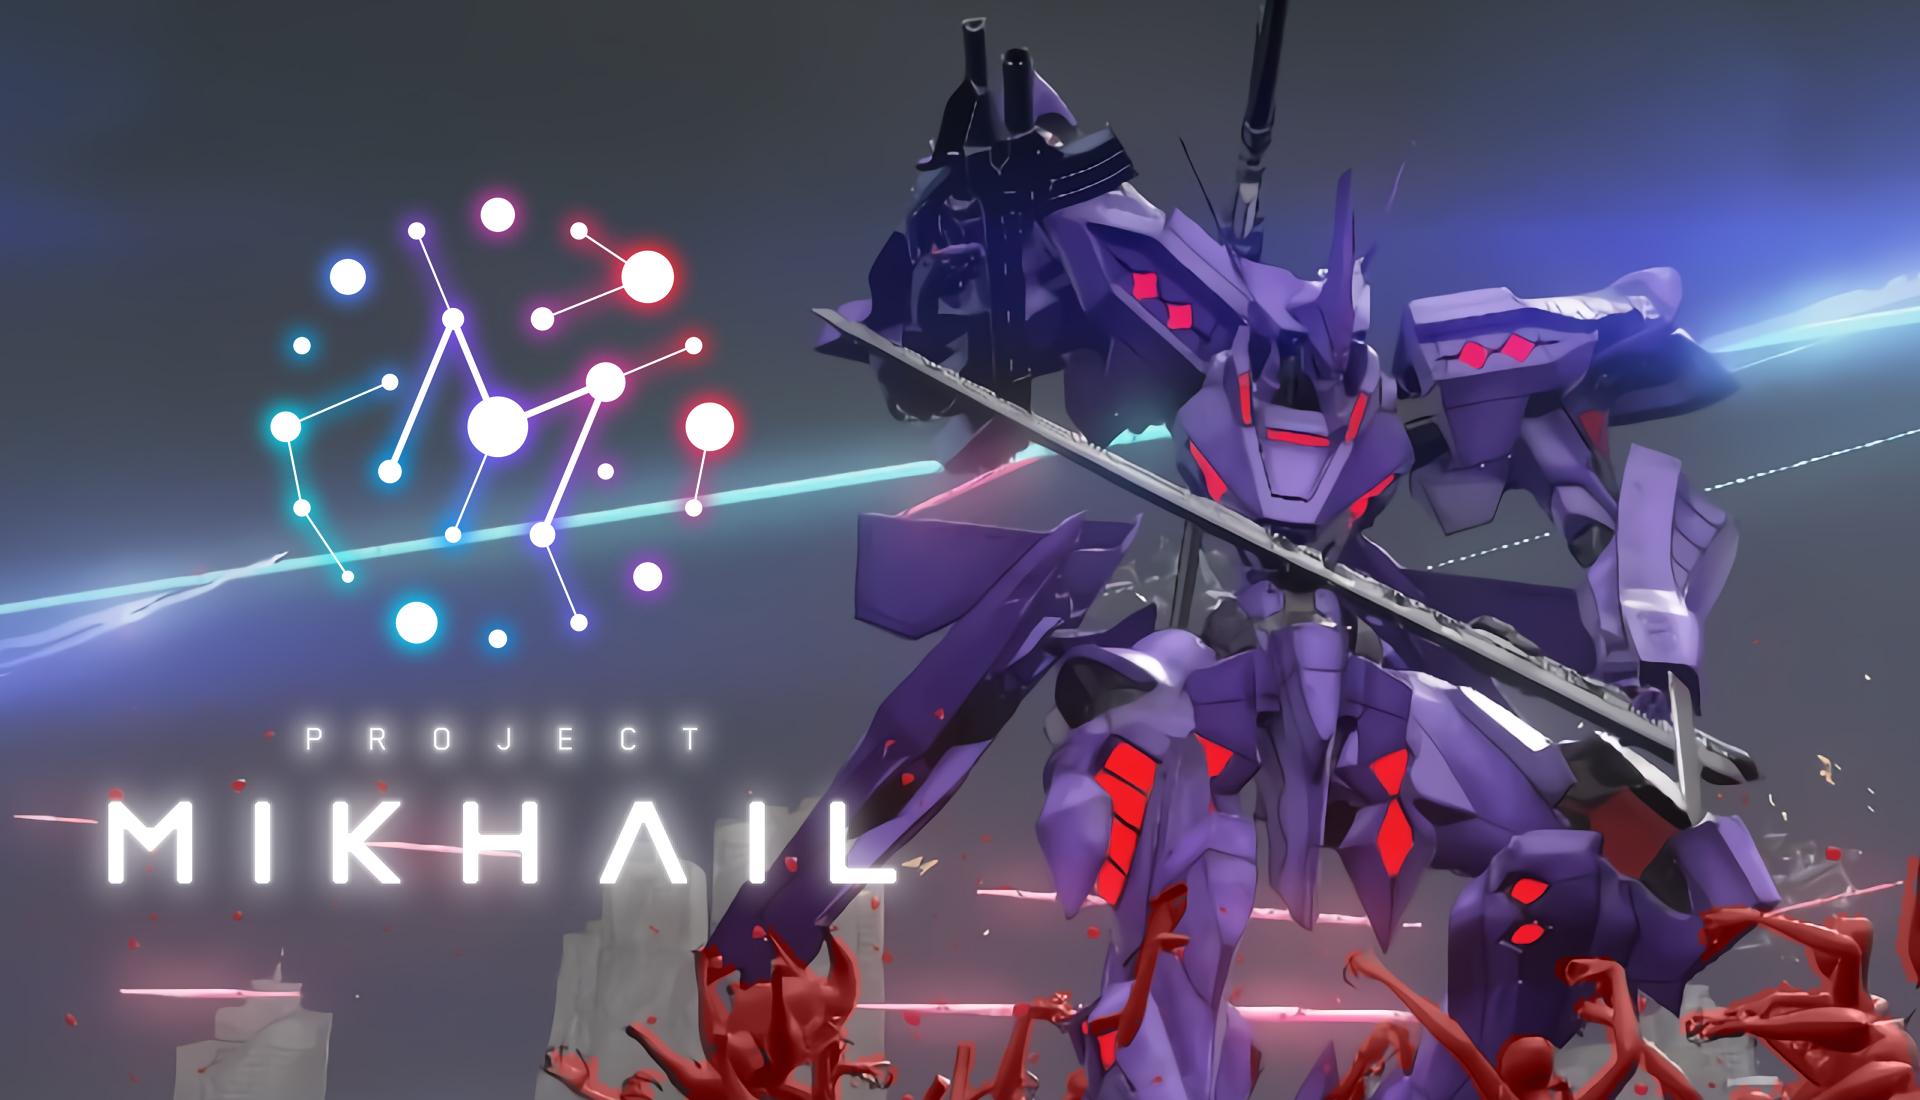 『Project MIKHAIL』Steamストアページ・トレーラー映像公開!